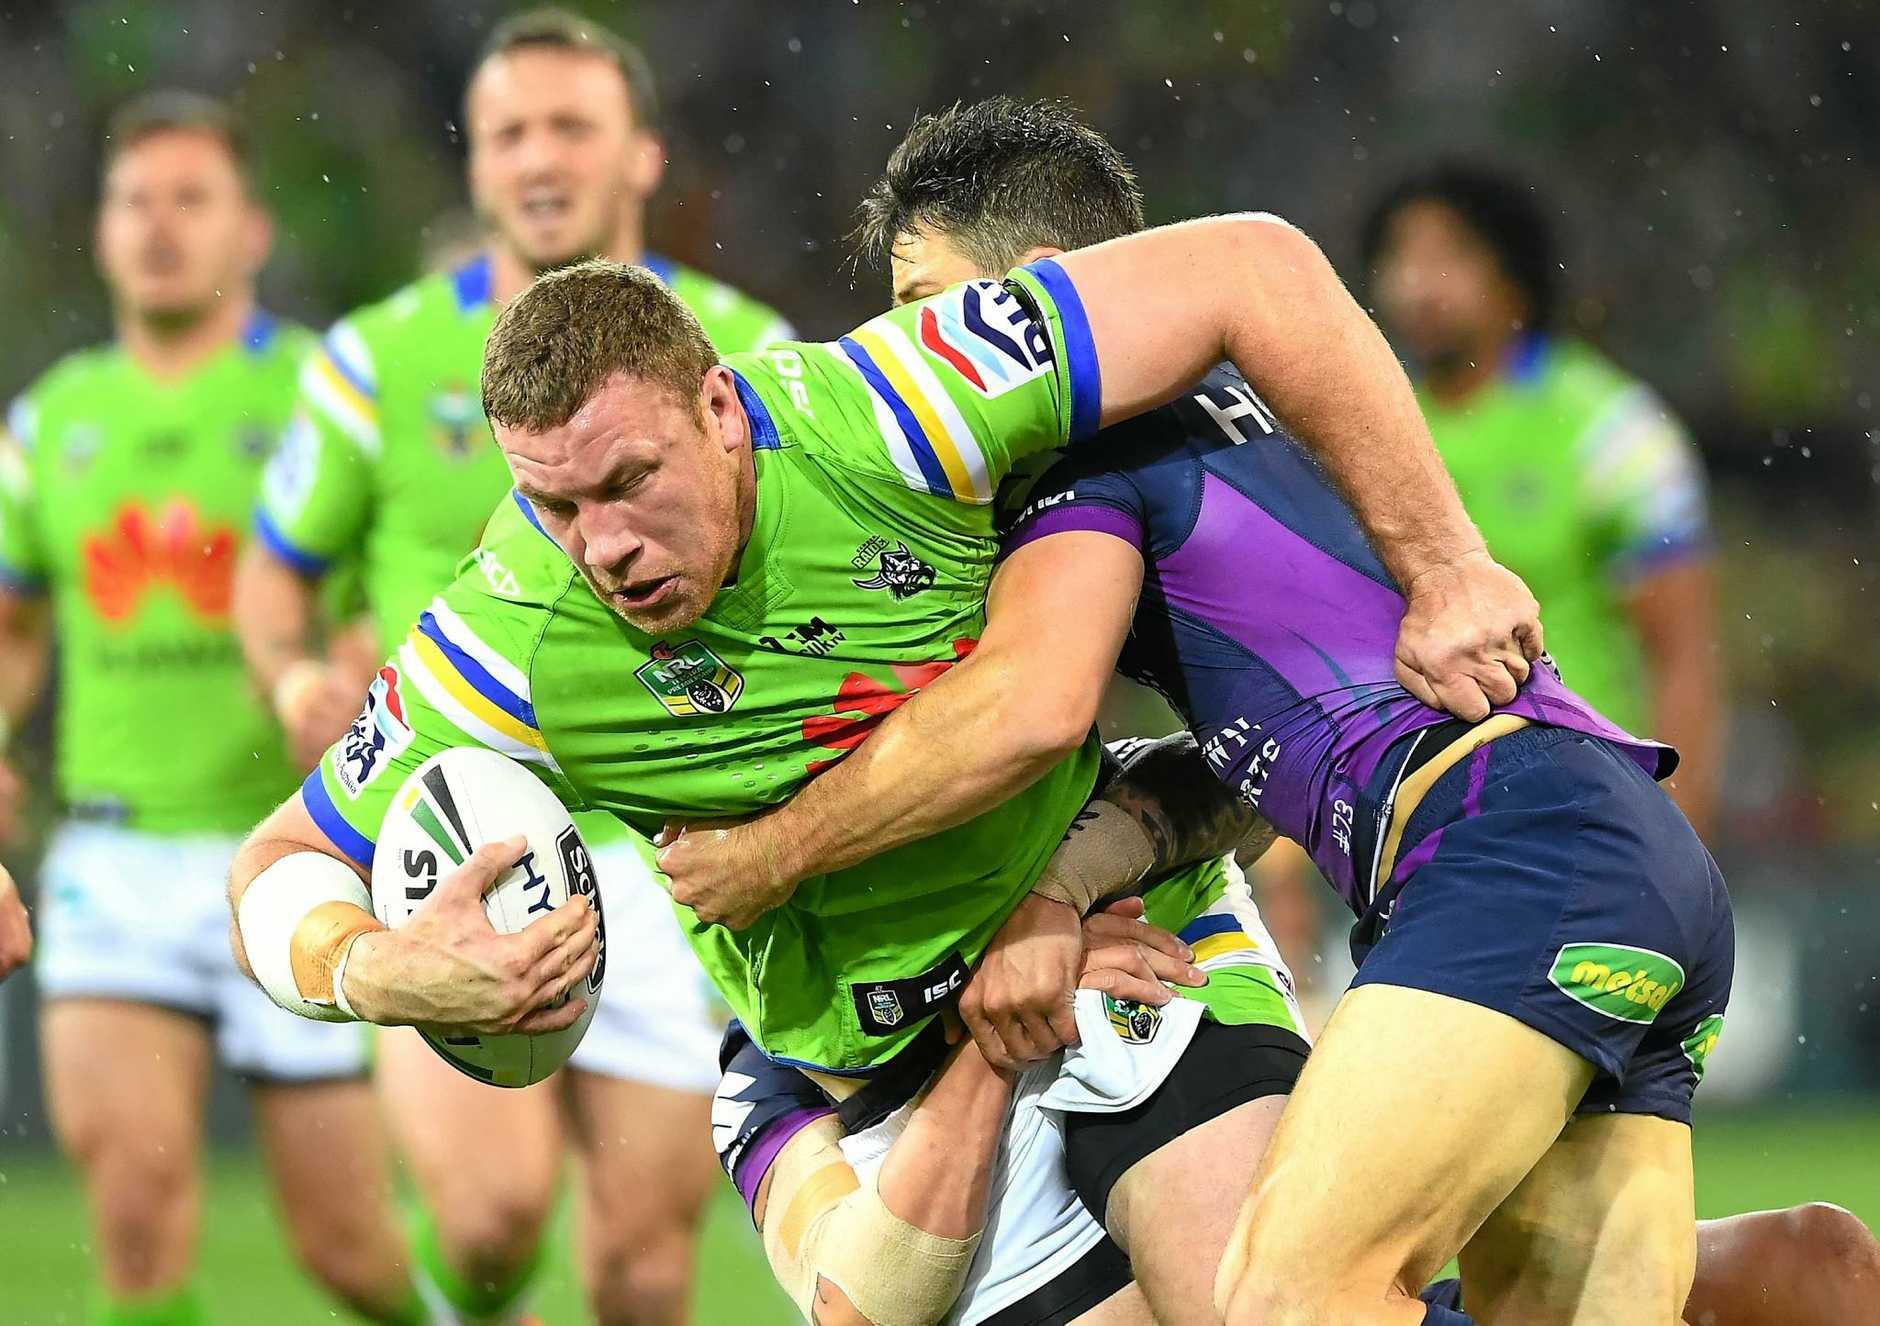 Raiders prop Shannon Boyd is set to make his Kangaroos debut against the Kiwis in Perth.